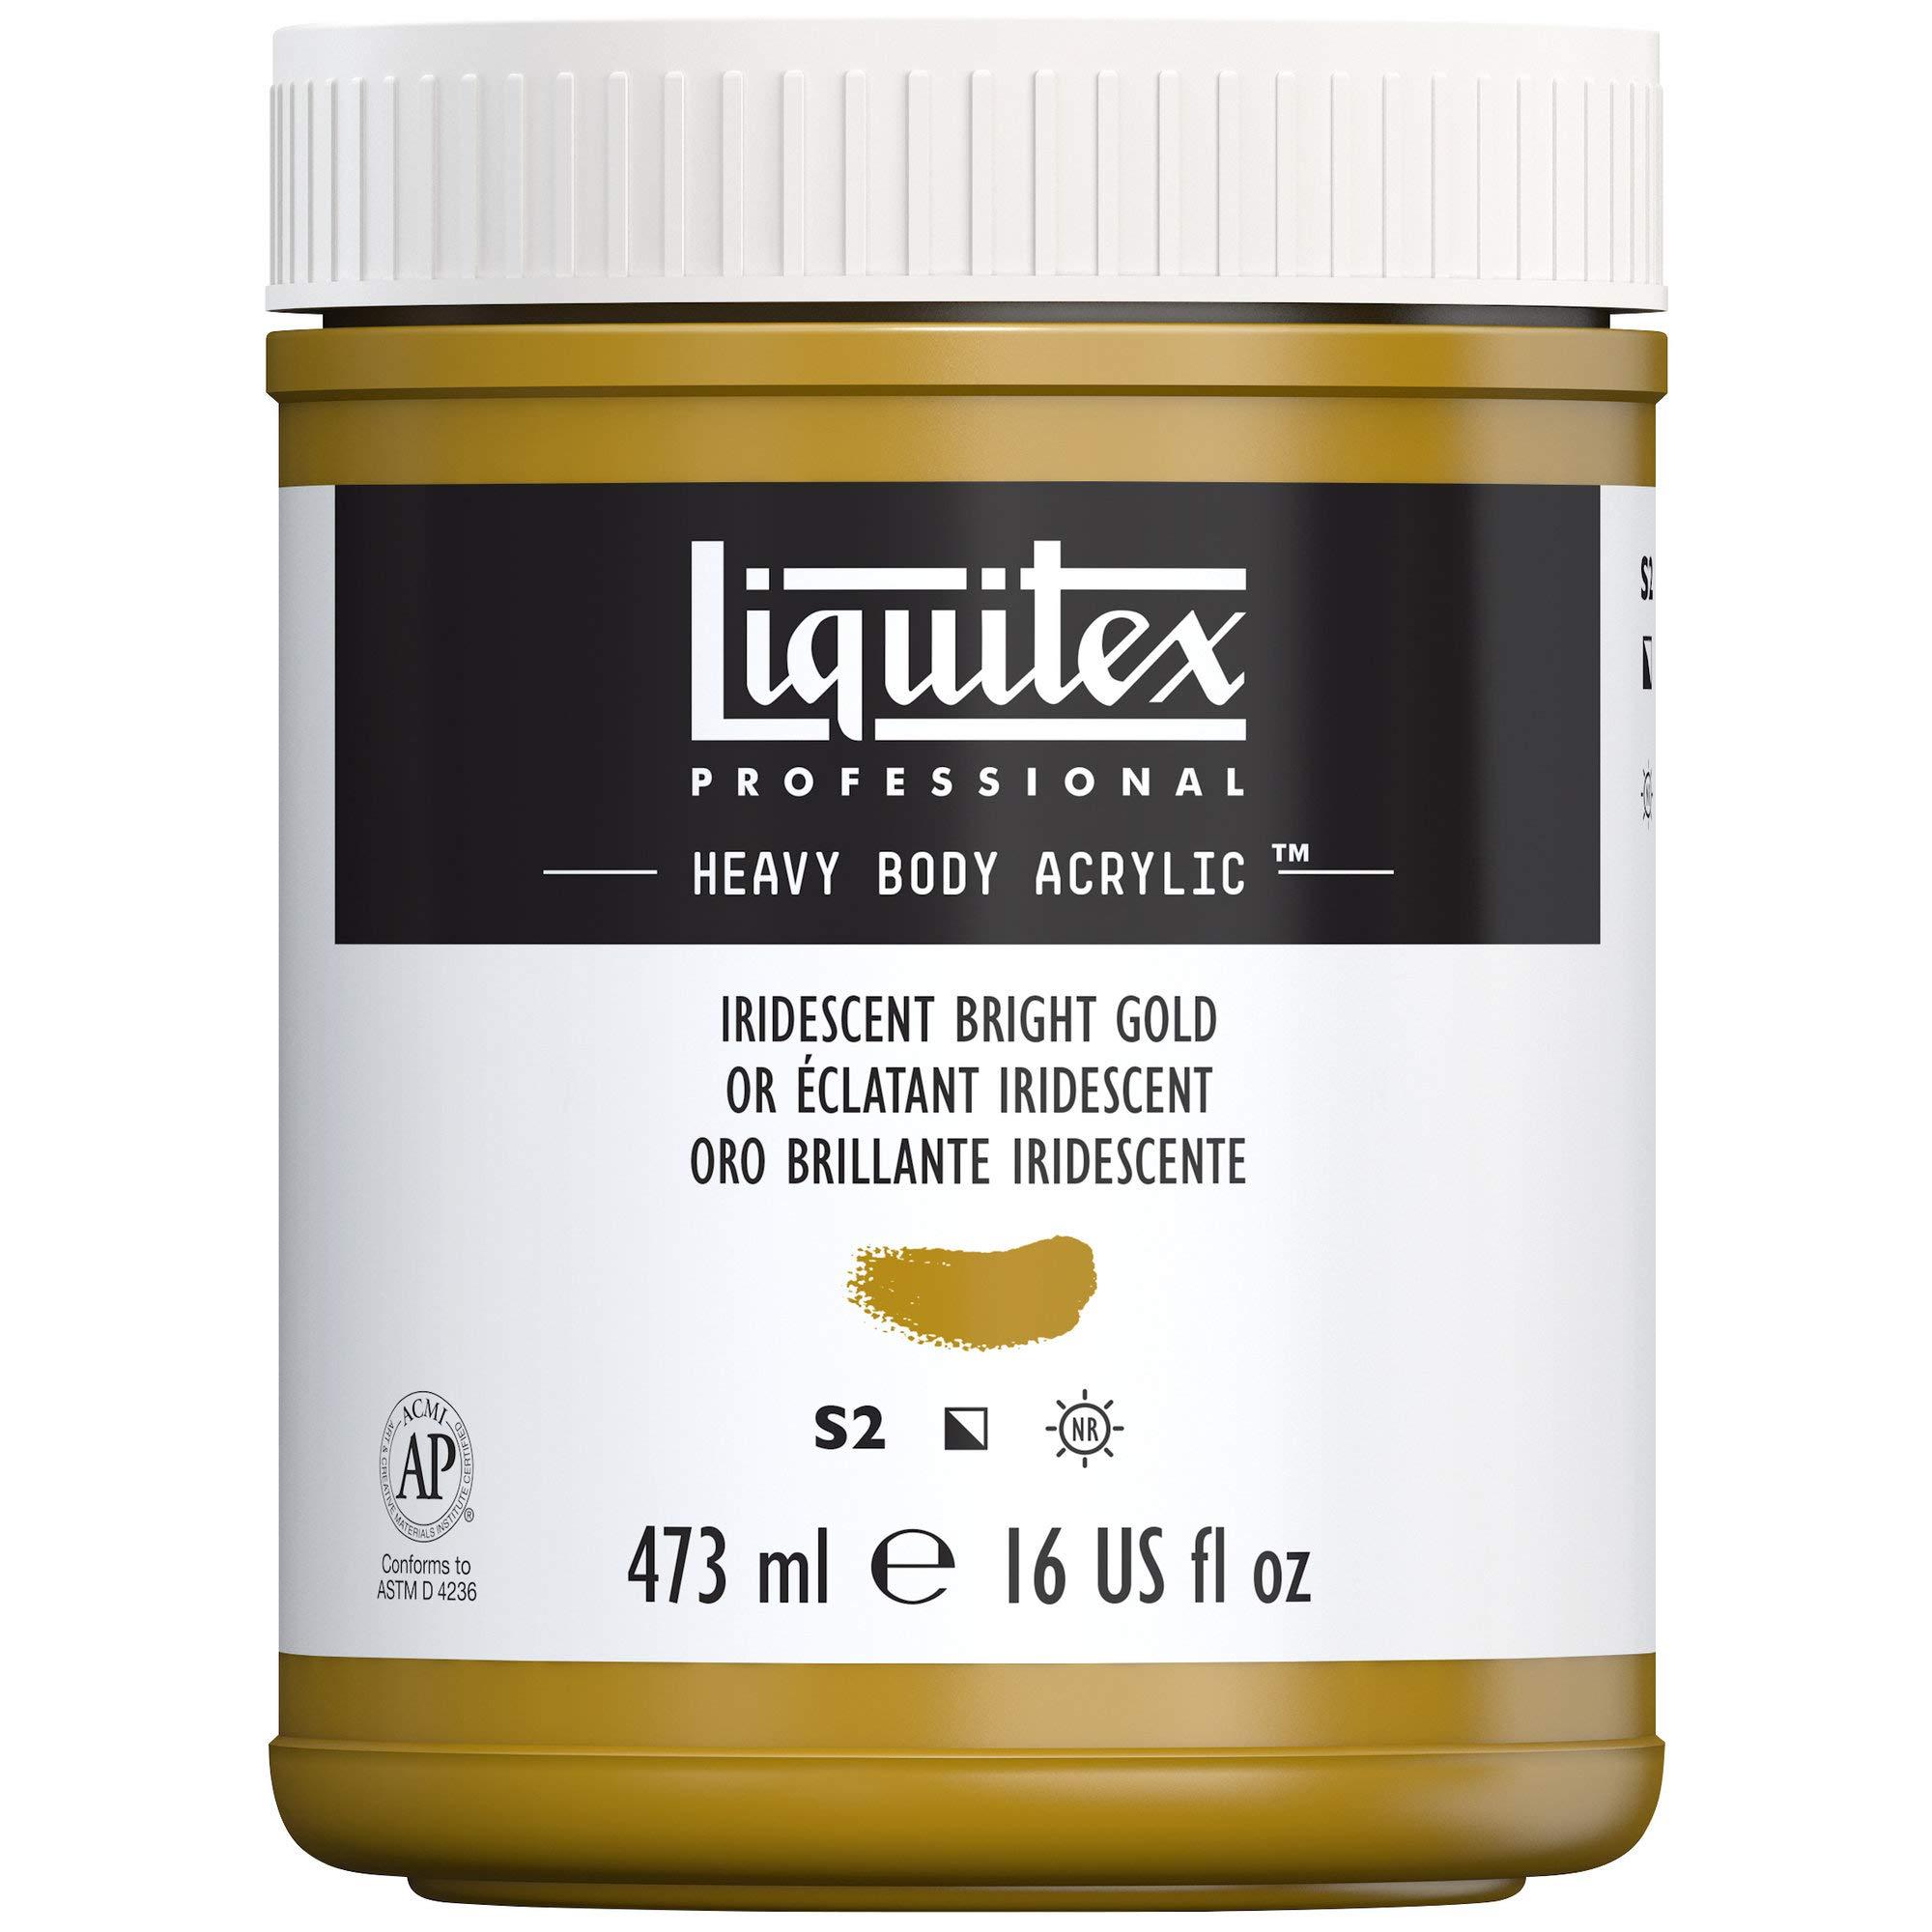 Liquitex Professional Heavy Body Acrylic Paint, 16-oz Jar, Iridescent Bright Gold by Liquitex